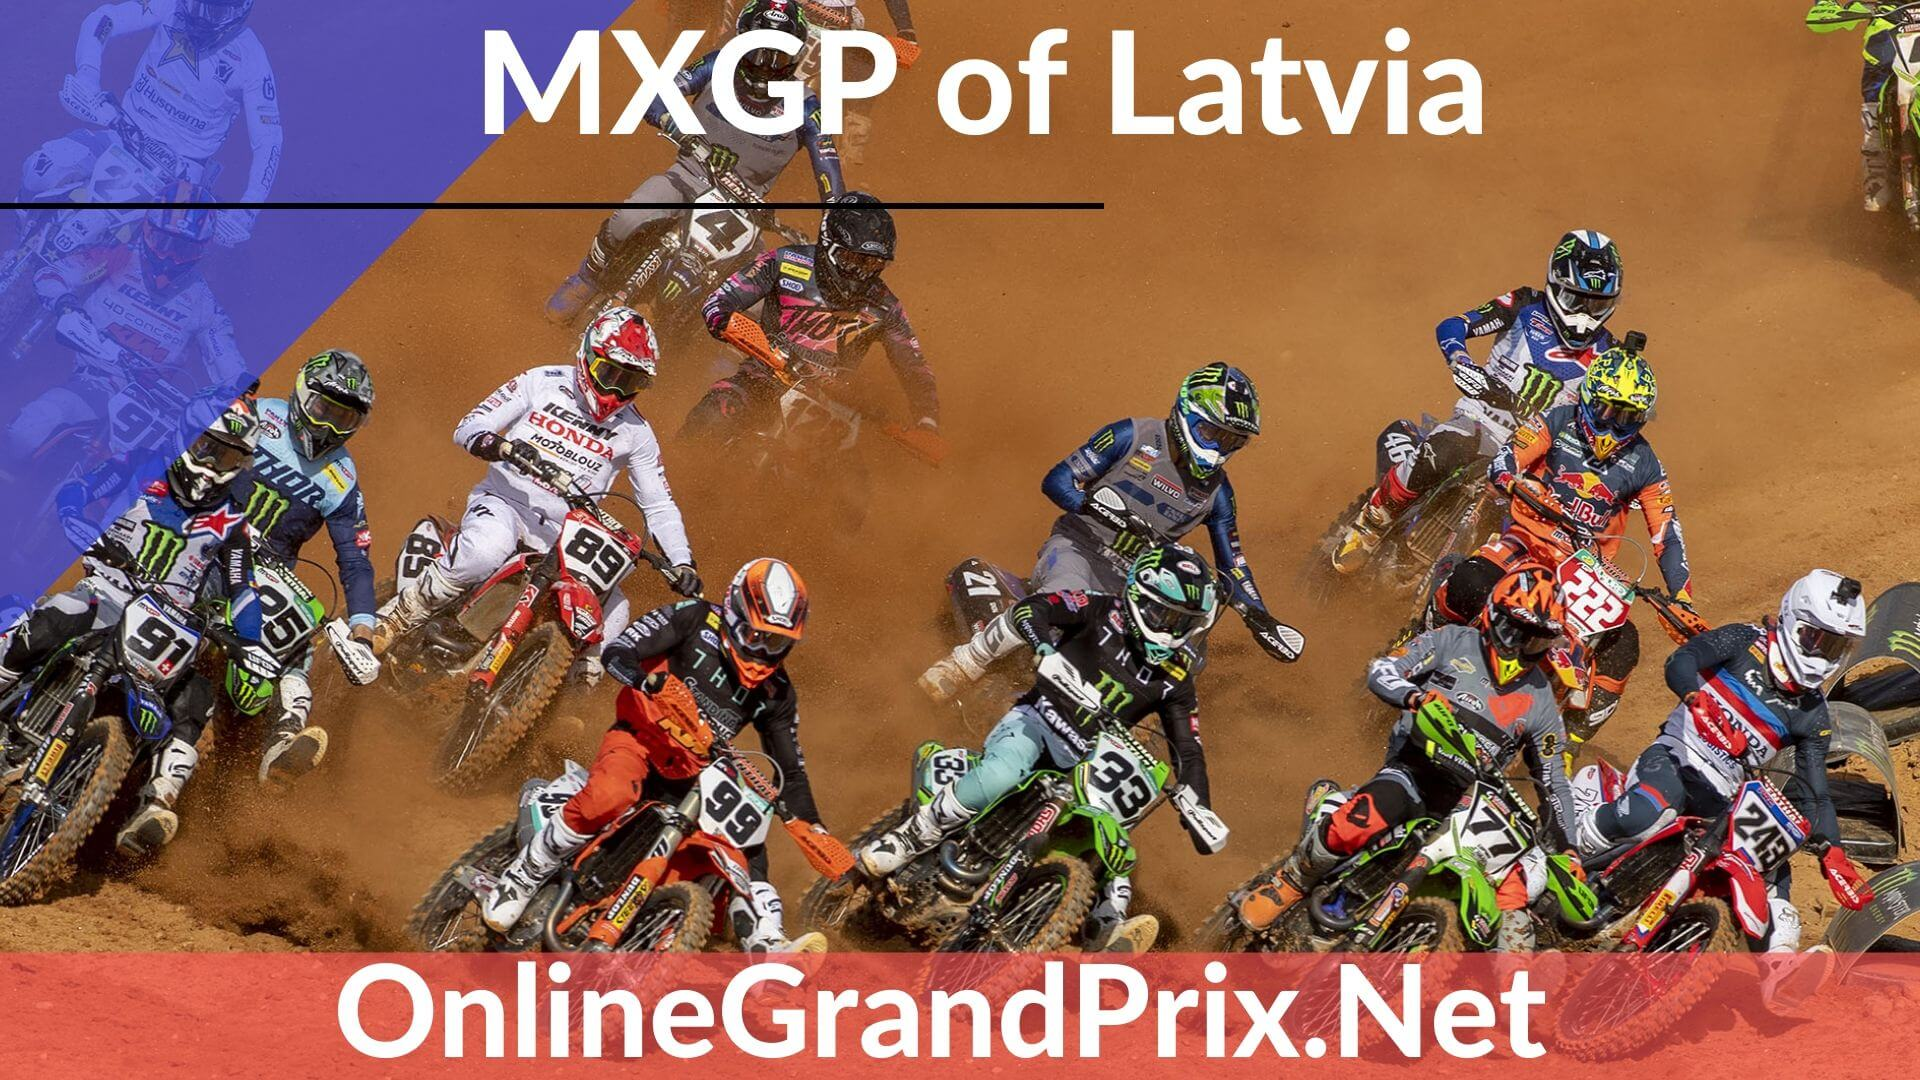 Latvia MXGP Live Stream 2020 | FIM MotoCross WC